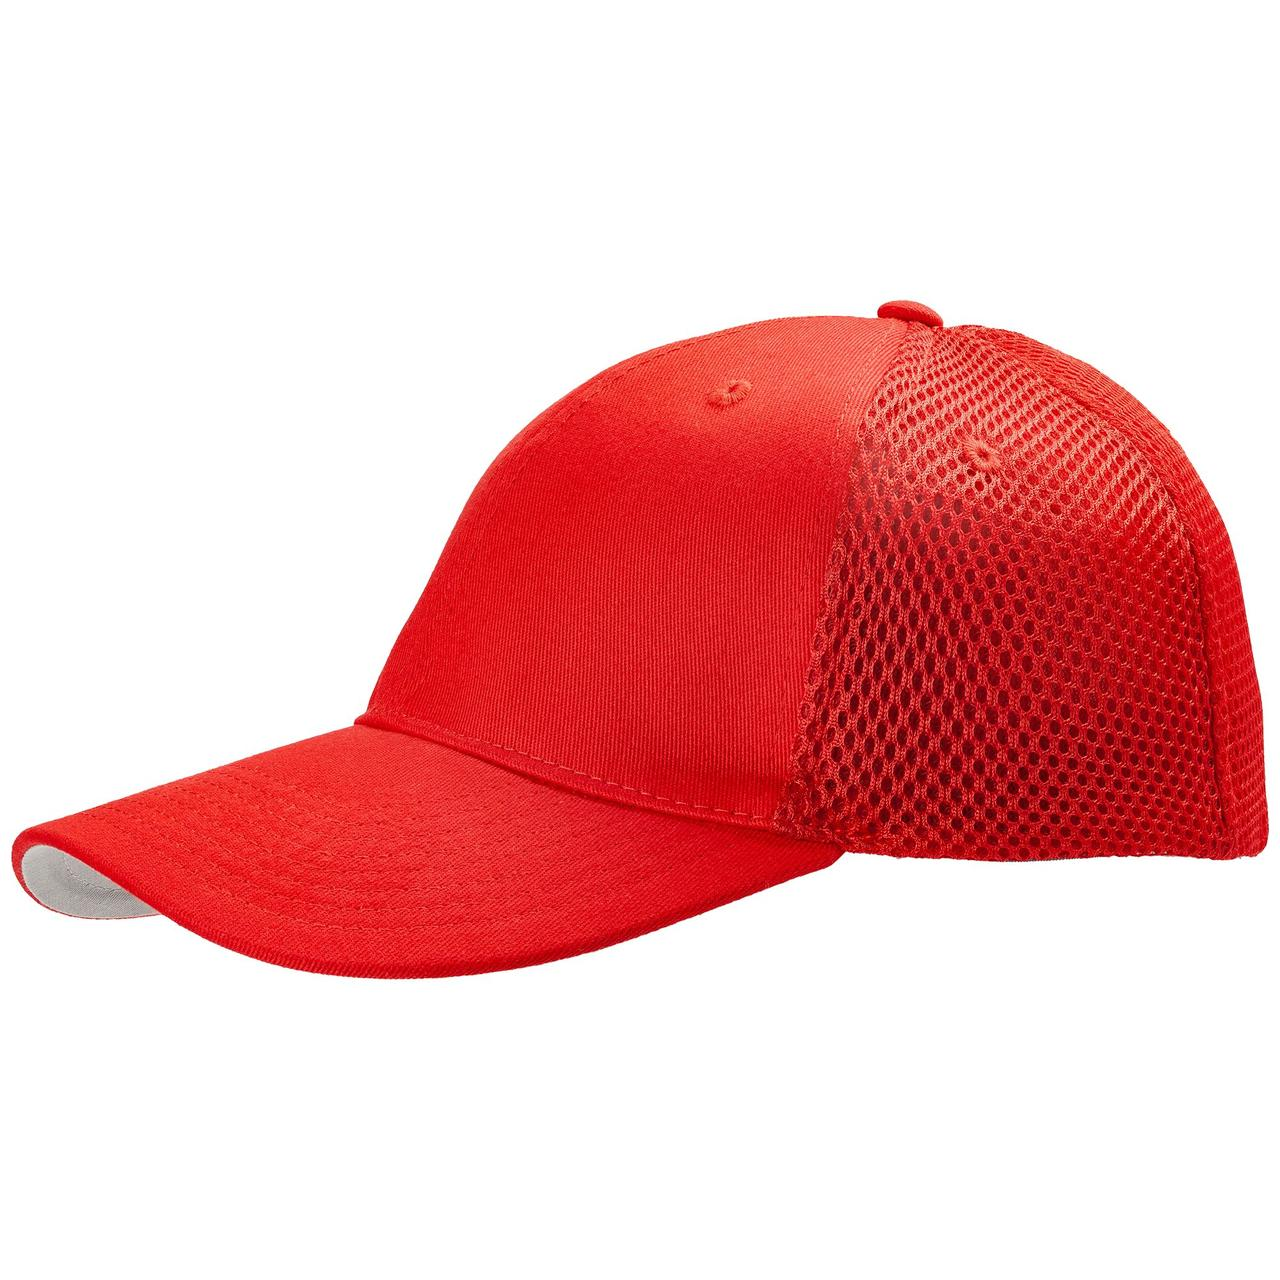 Бейсболка Ronas Hill, красная (артикул 7258.50)